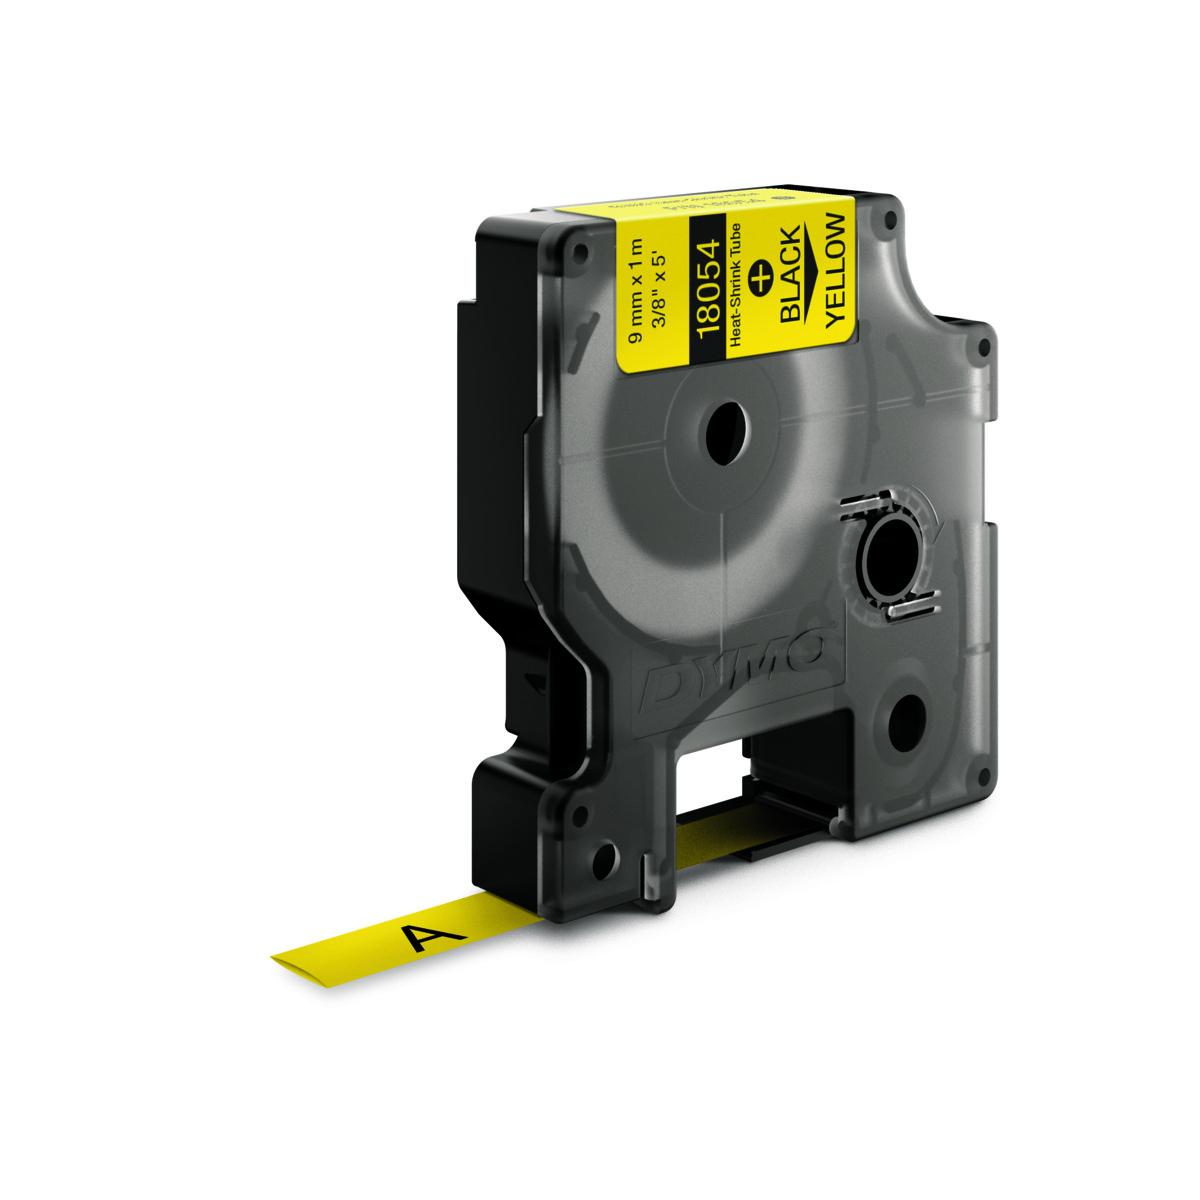 Dymo RHINO 18054 - IND Krimpkous label - 9mm zwart op geel